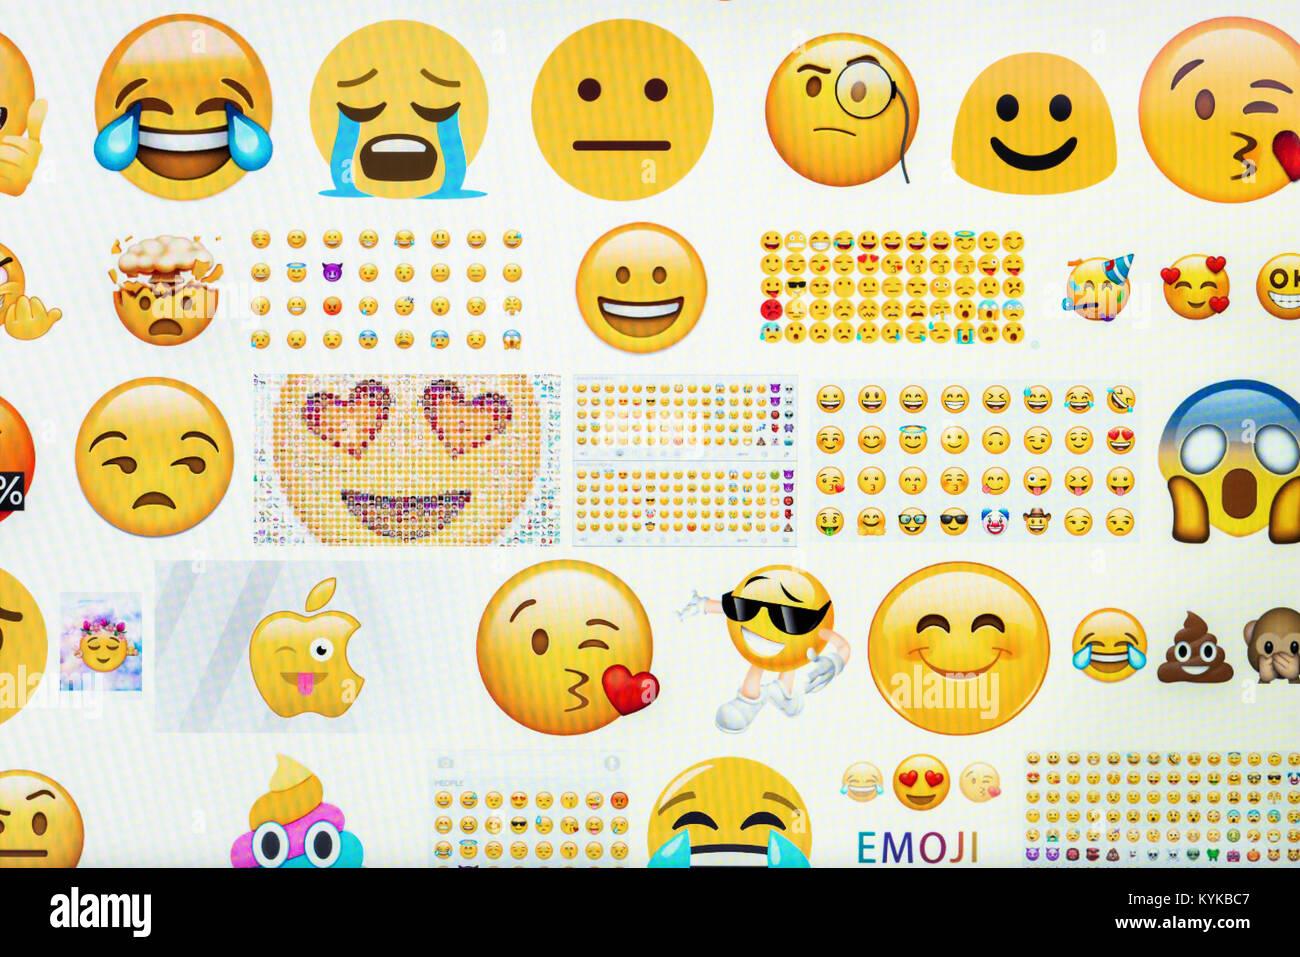 Emoji on computer screen. - Stock Image